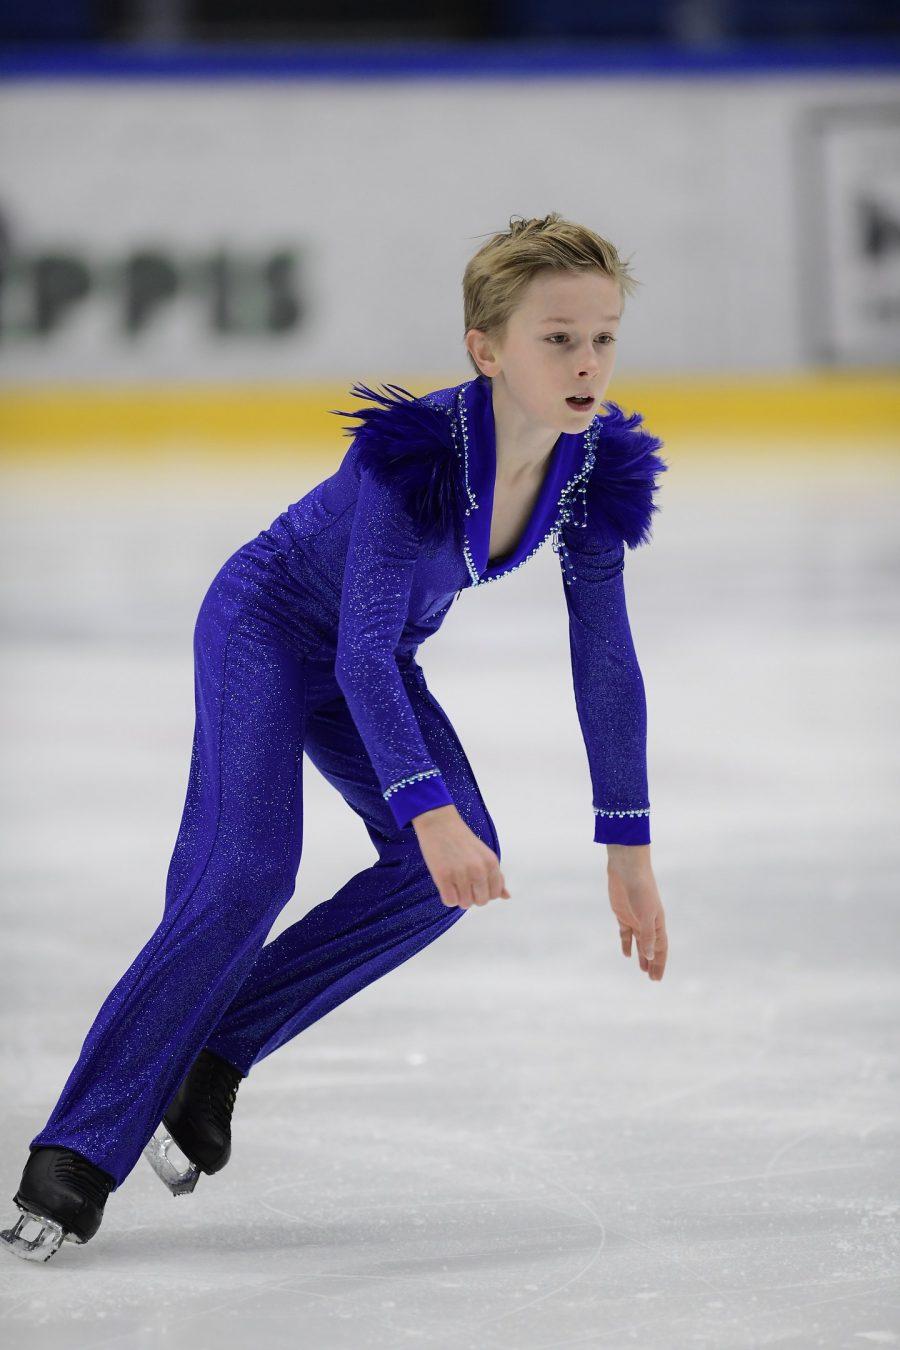 Matias Lindfors Kuva Antti Lehto